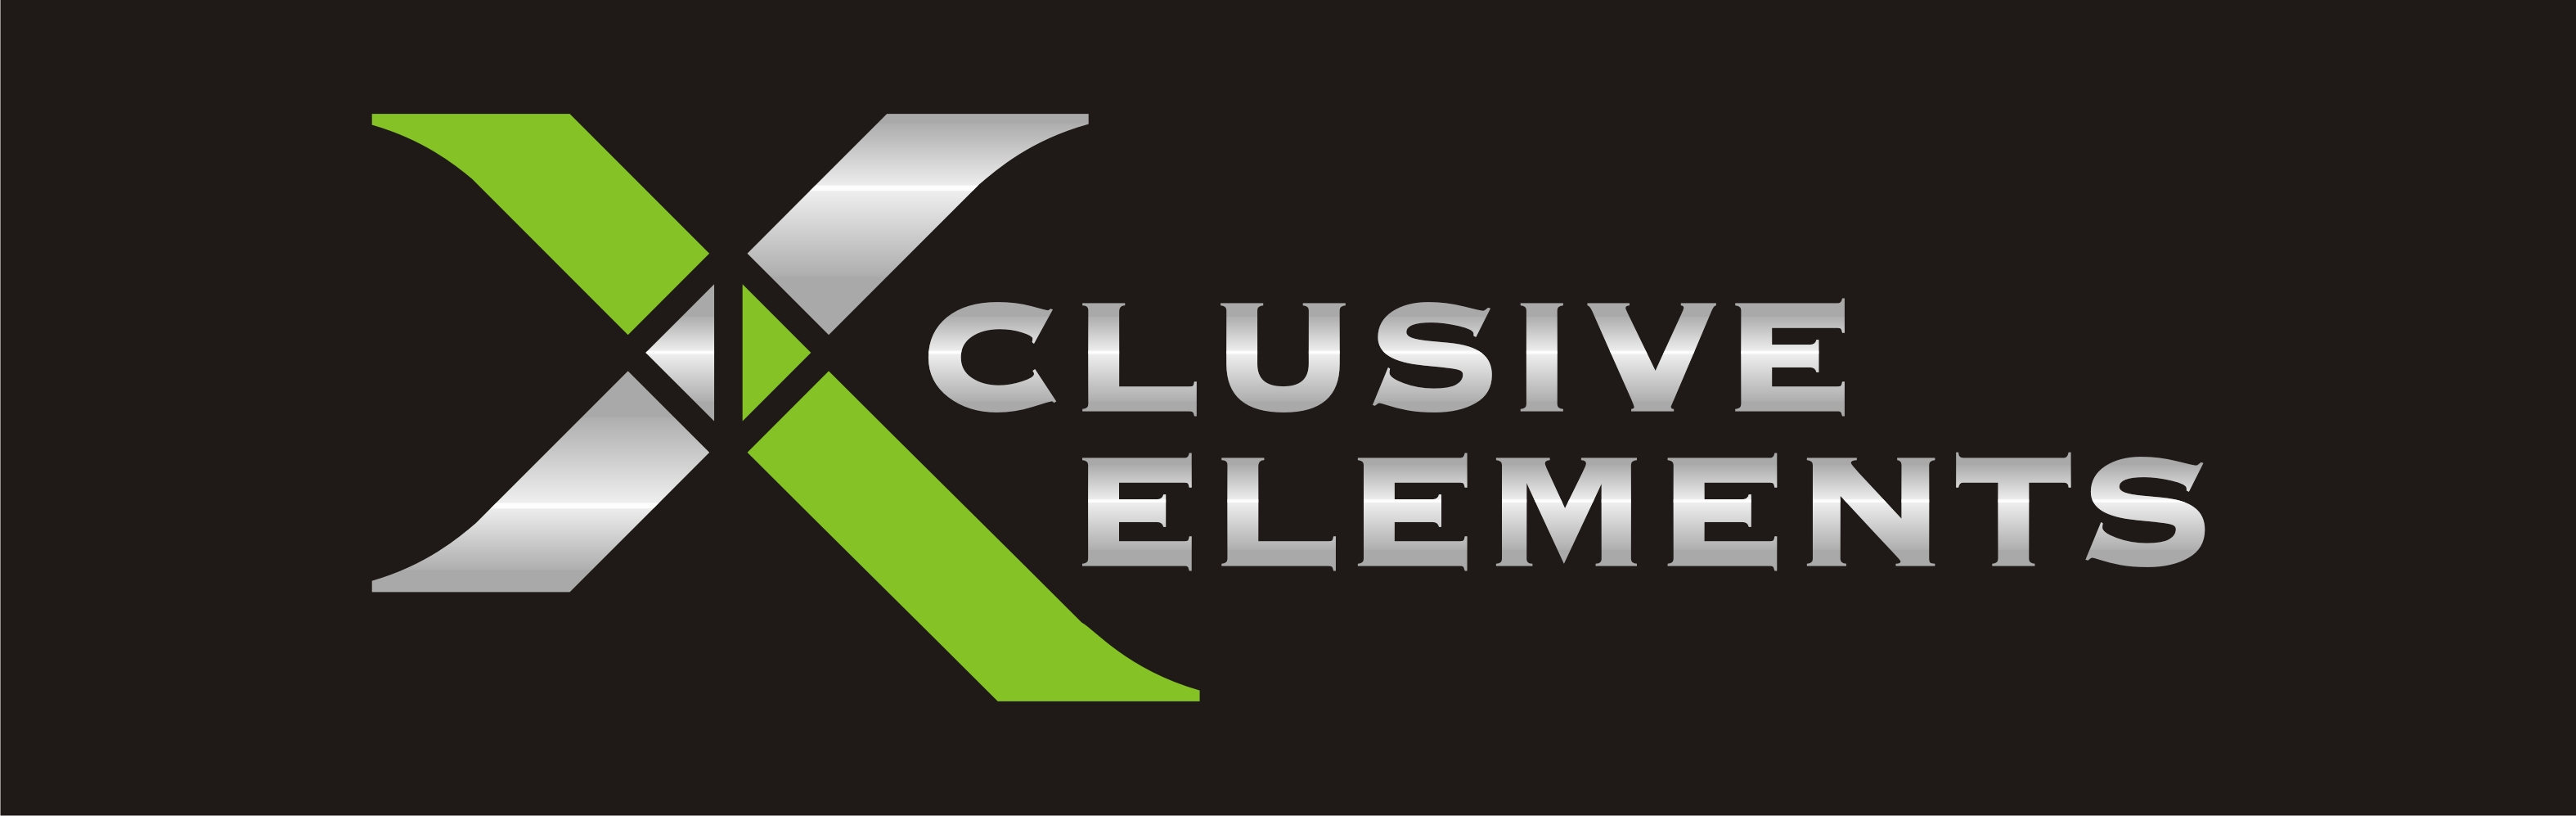 xclusive_logo_bg